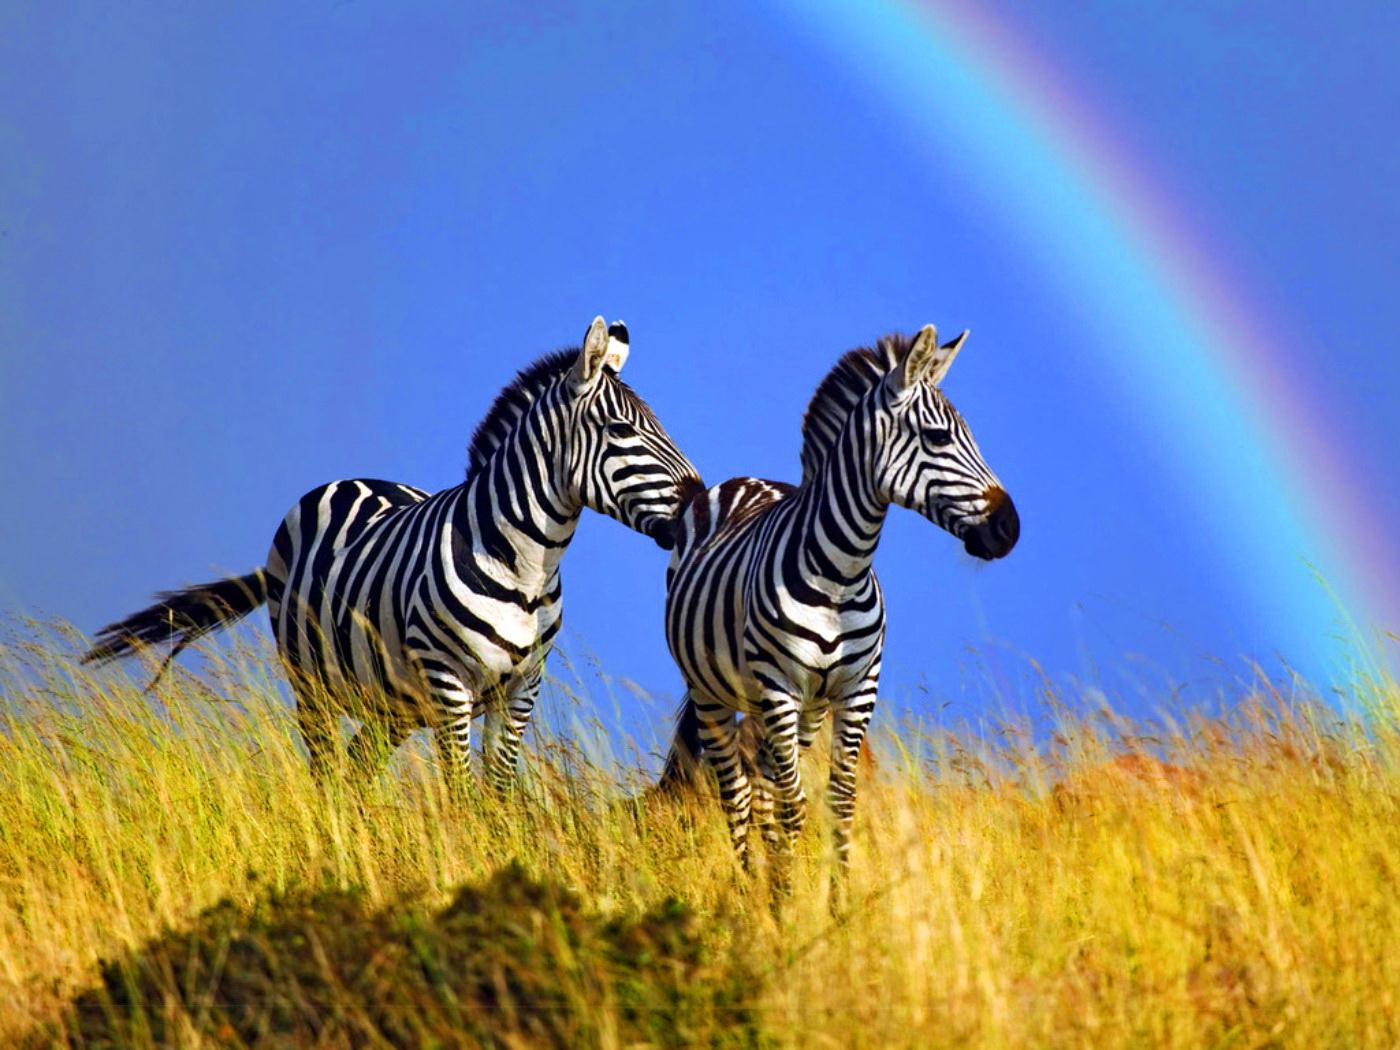 Beautiful Animal Zebras Wallpaper 3